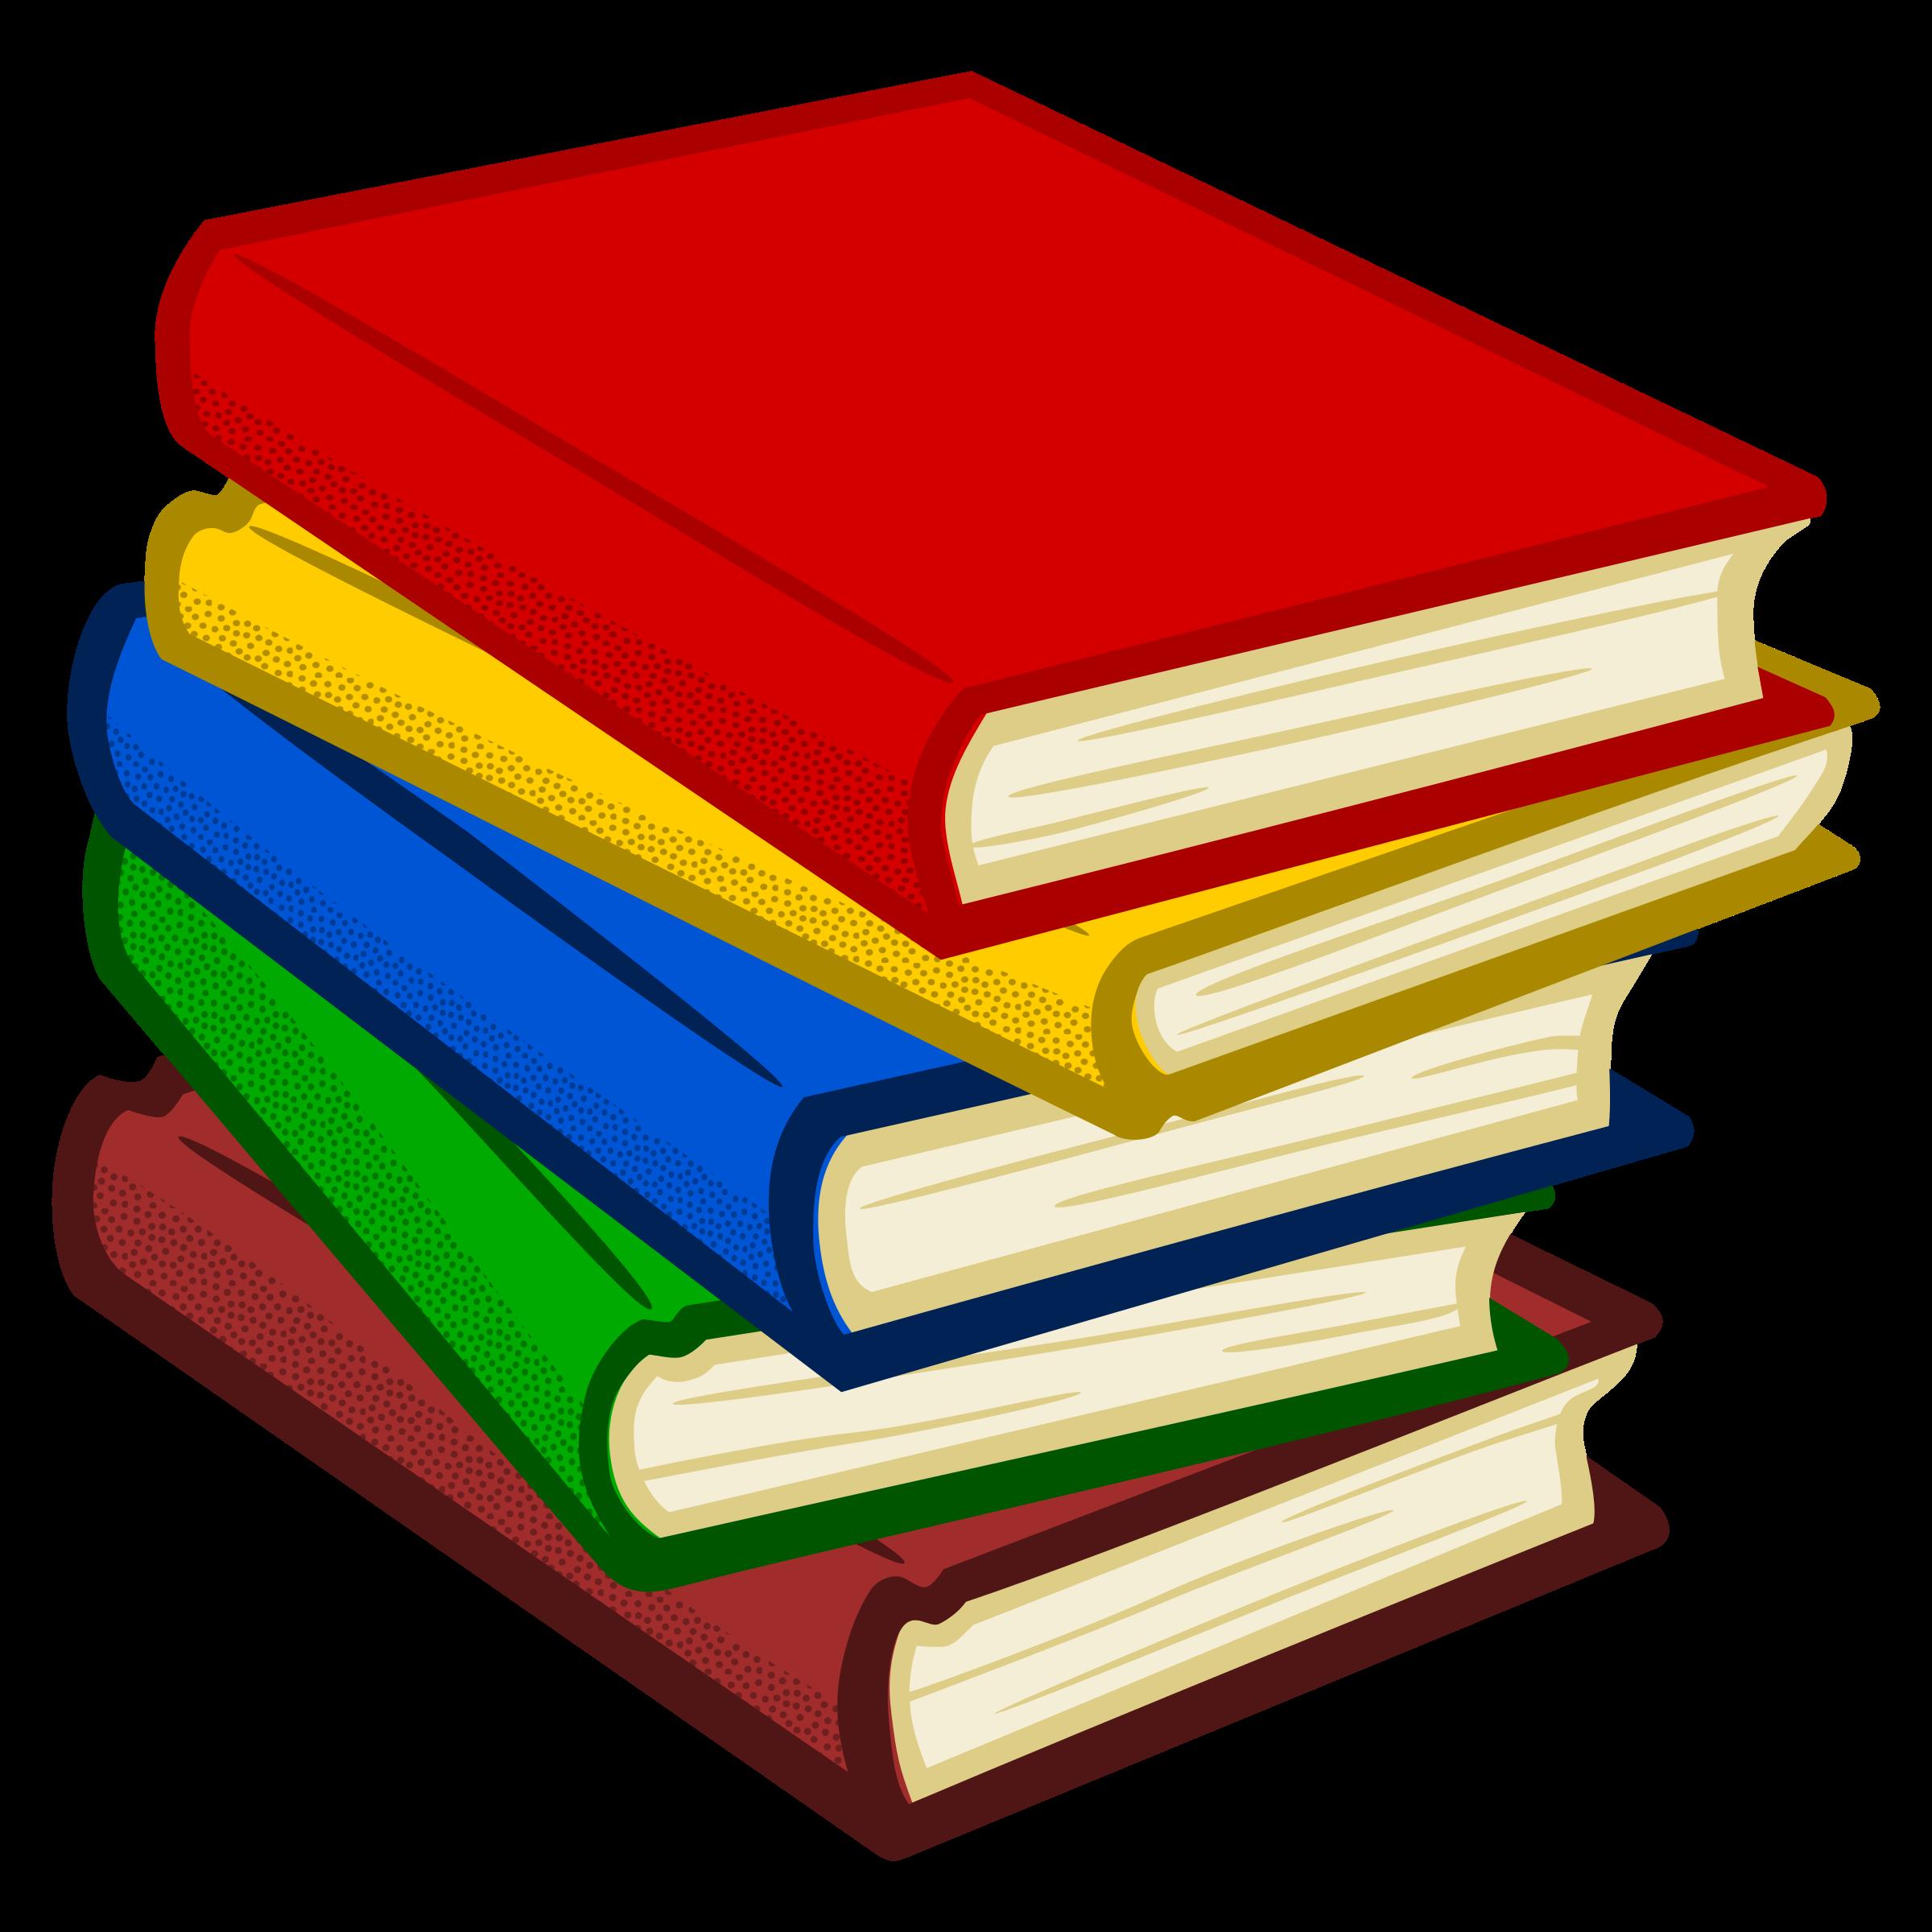 2400x2400 Astounding Inspiration Clip Art Books Open Book Color Clipart